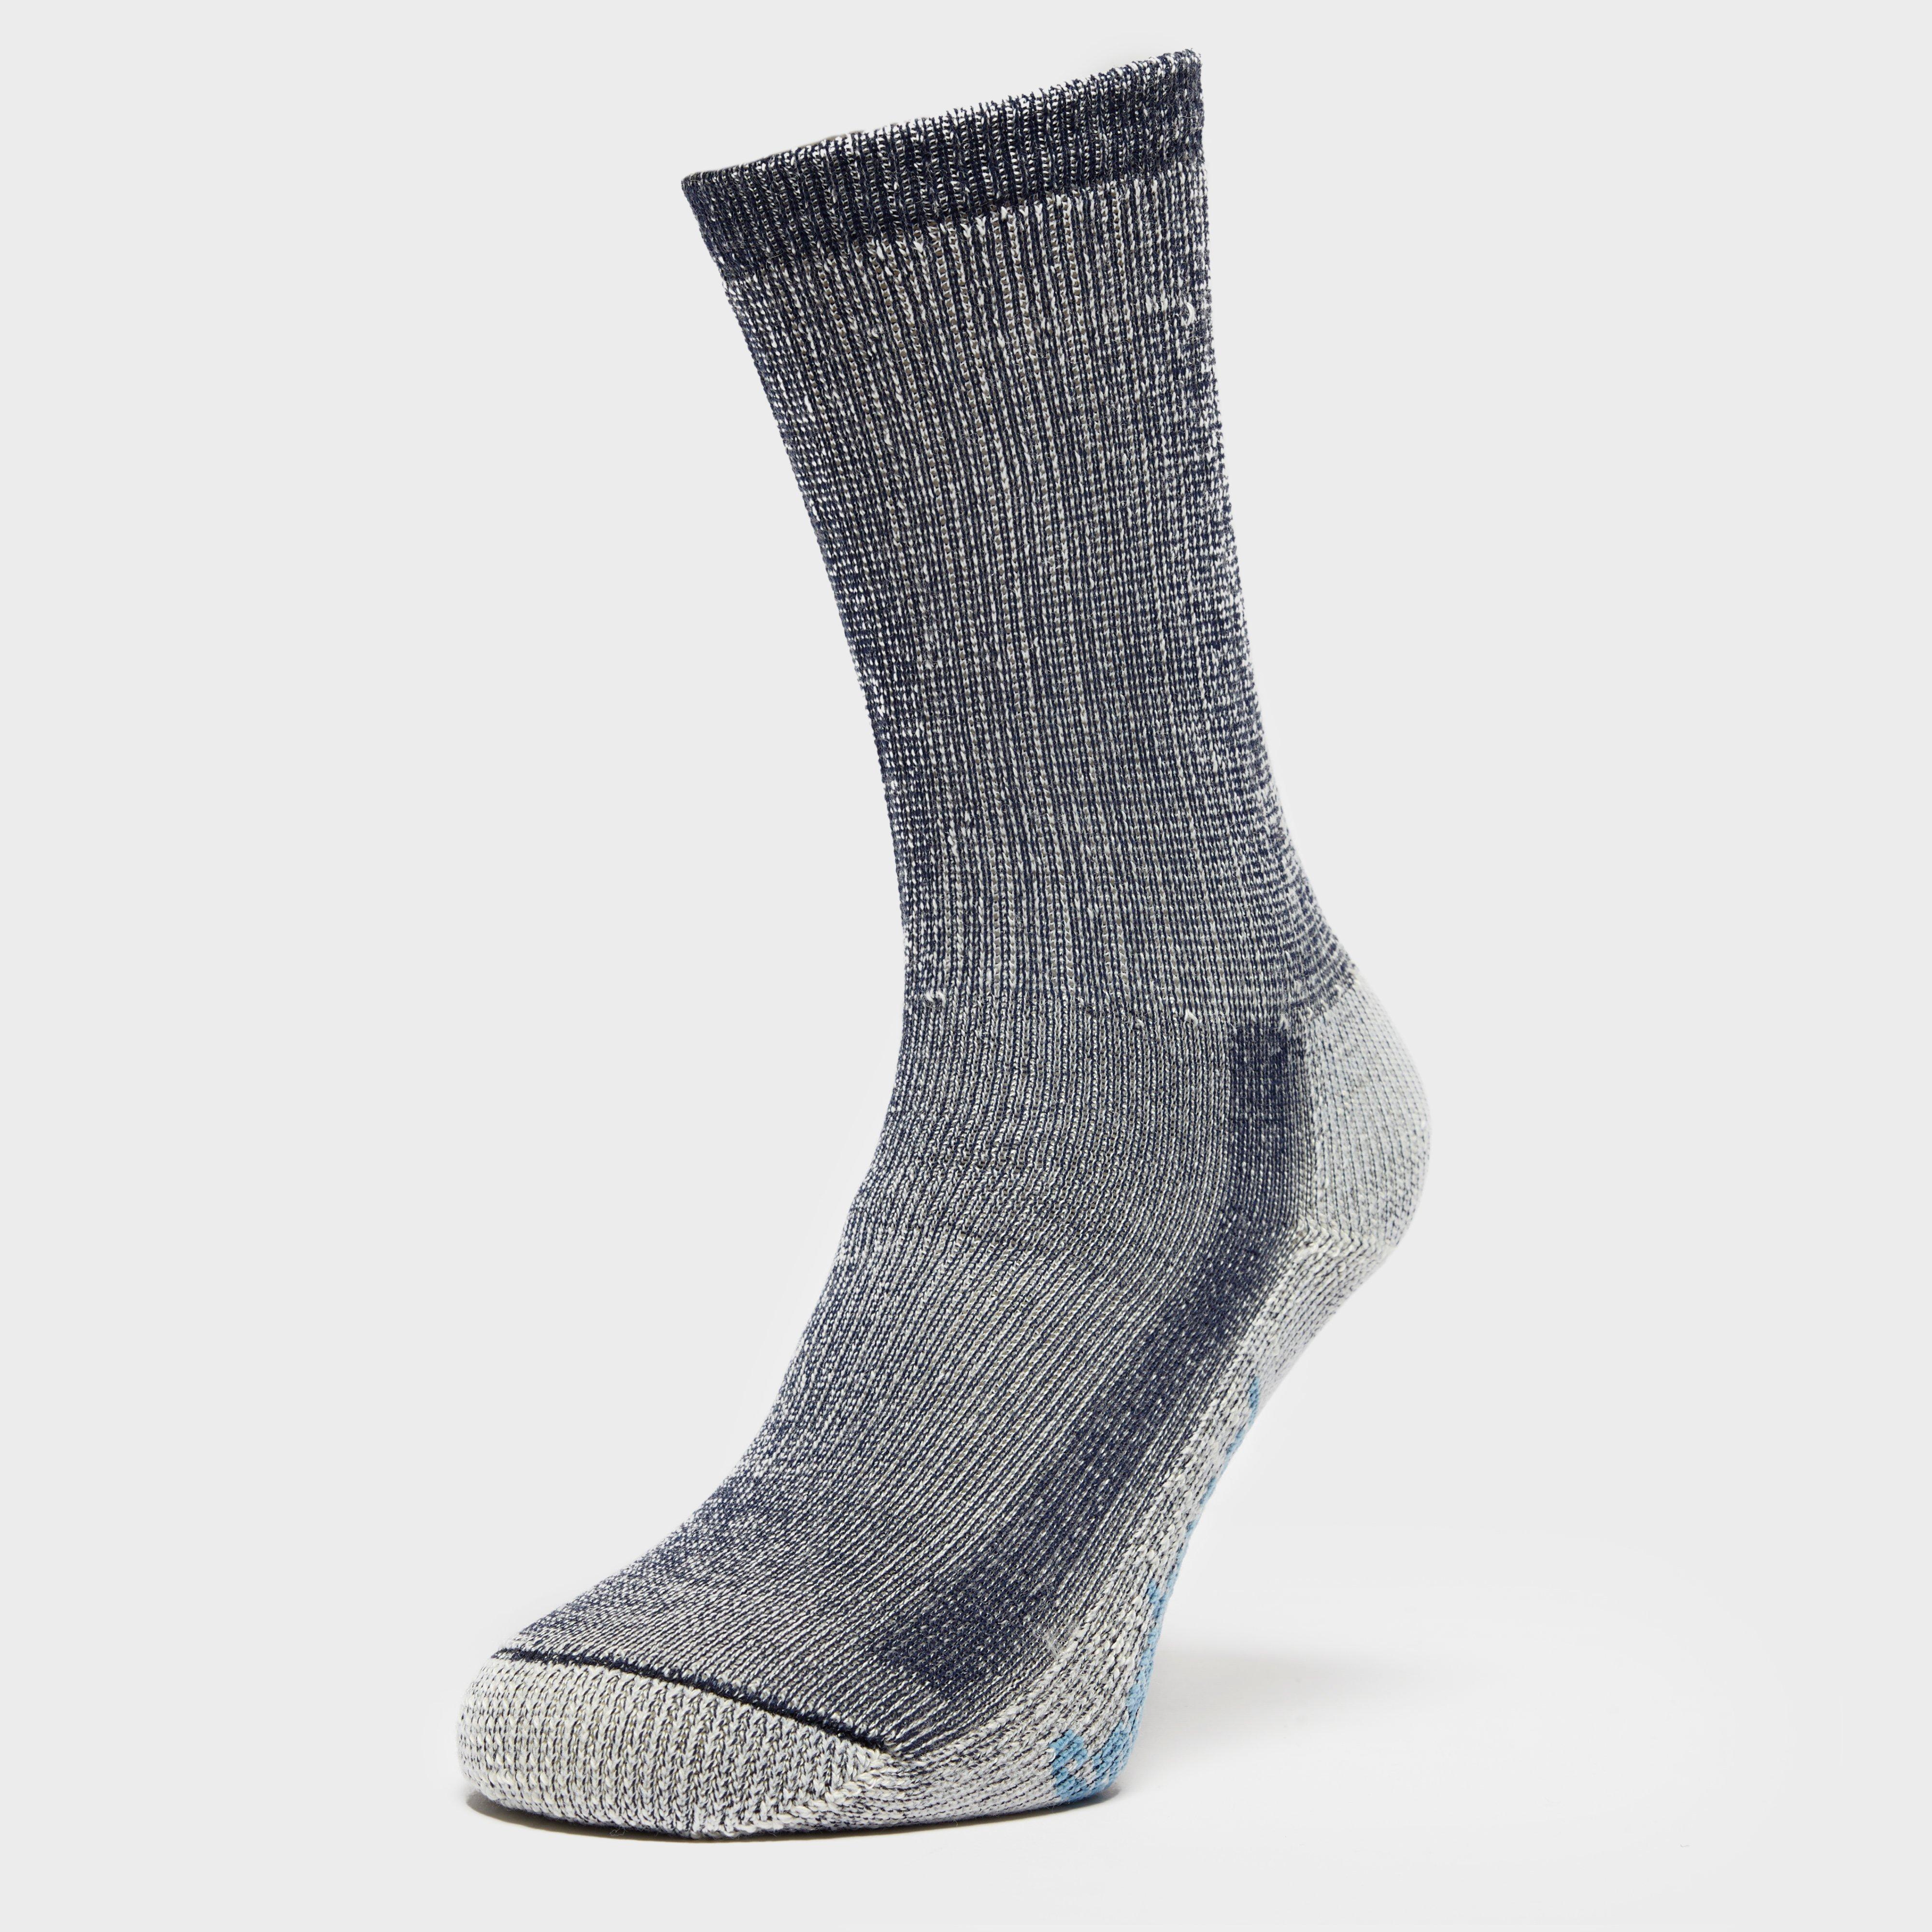 Smartwool Women's Hiking Medium Crew Socks, Grey